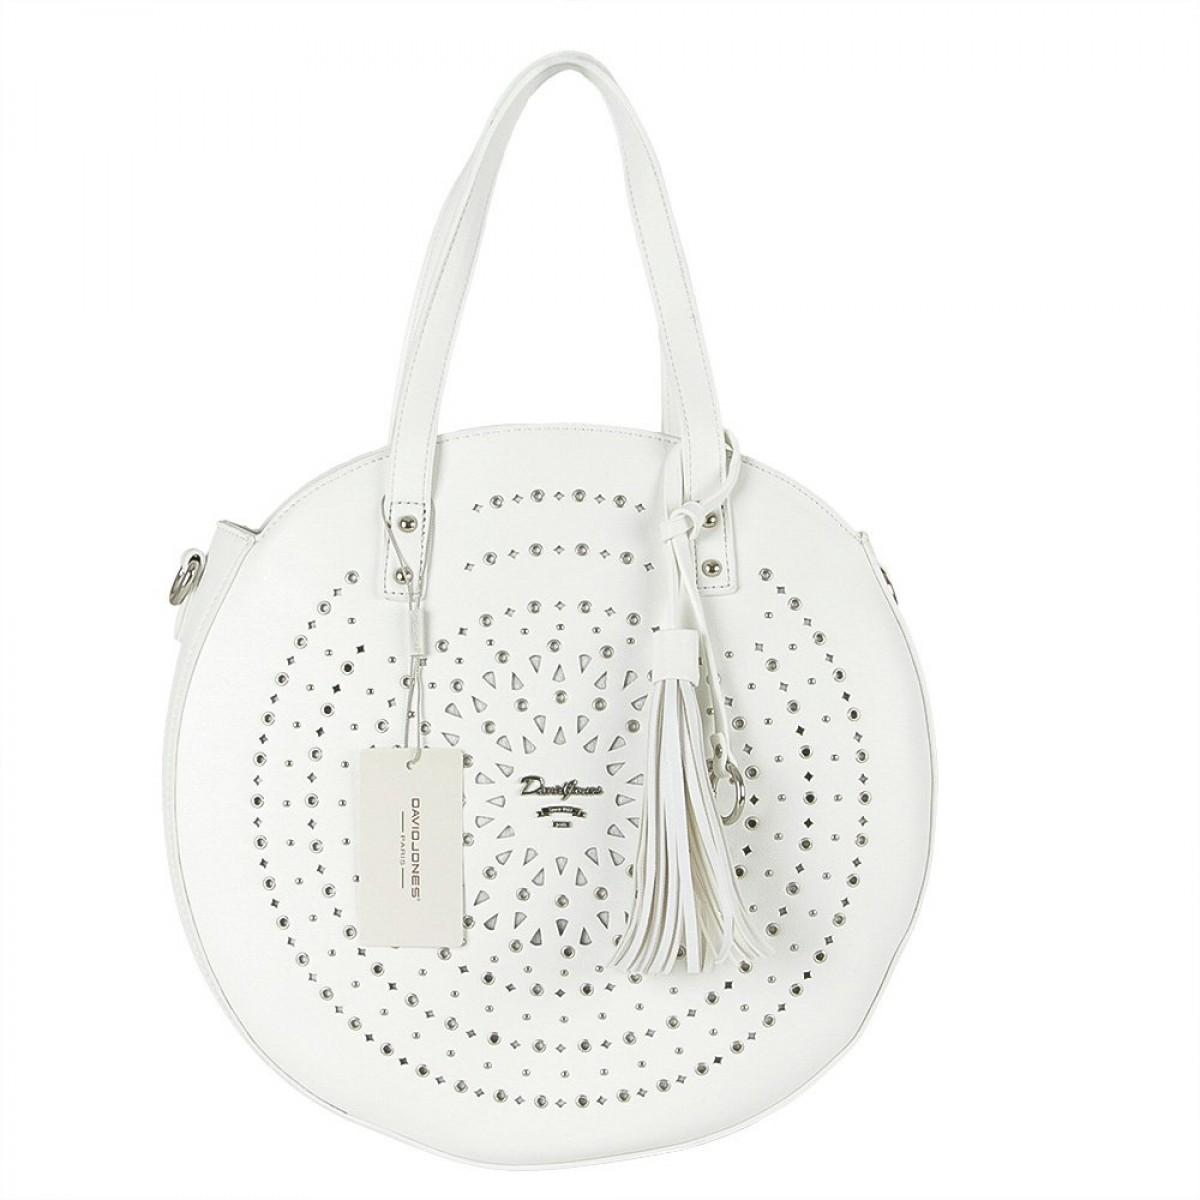 Жіноча сумка David Jones 6303-1 WHITE